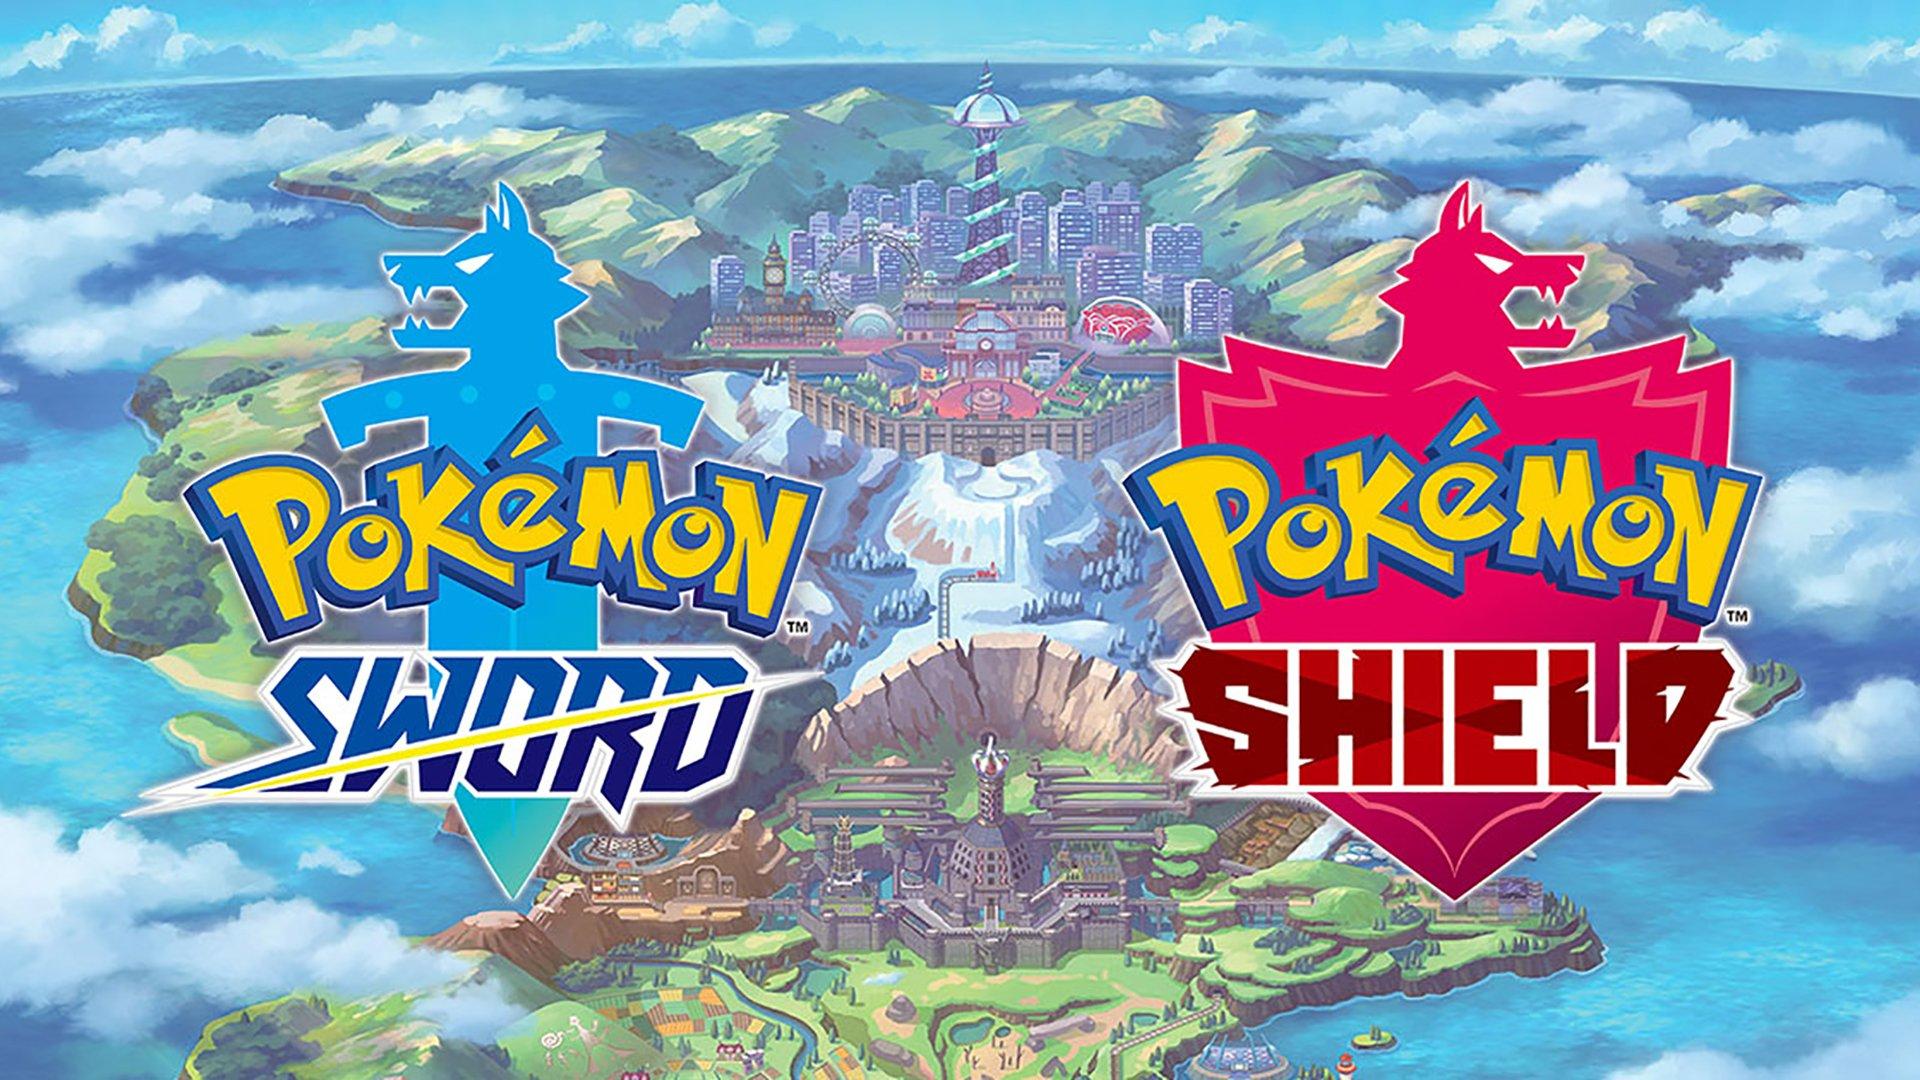 Nintendo and GameFreak Announce Pokemon Sword and Shield